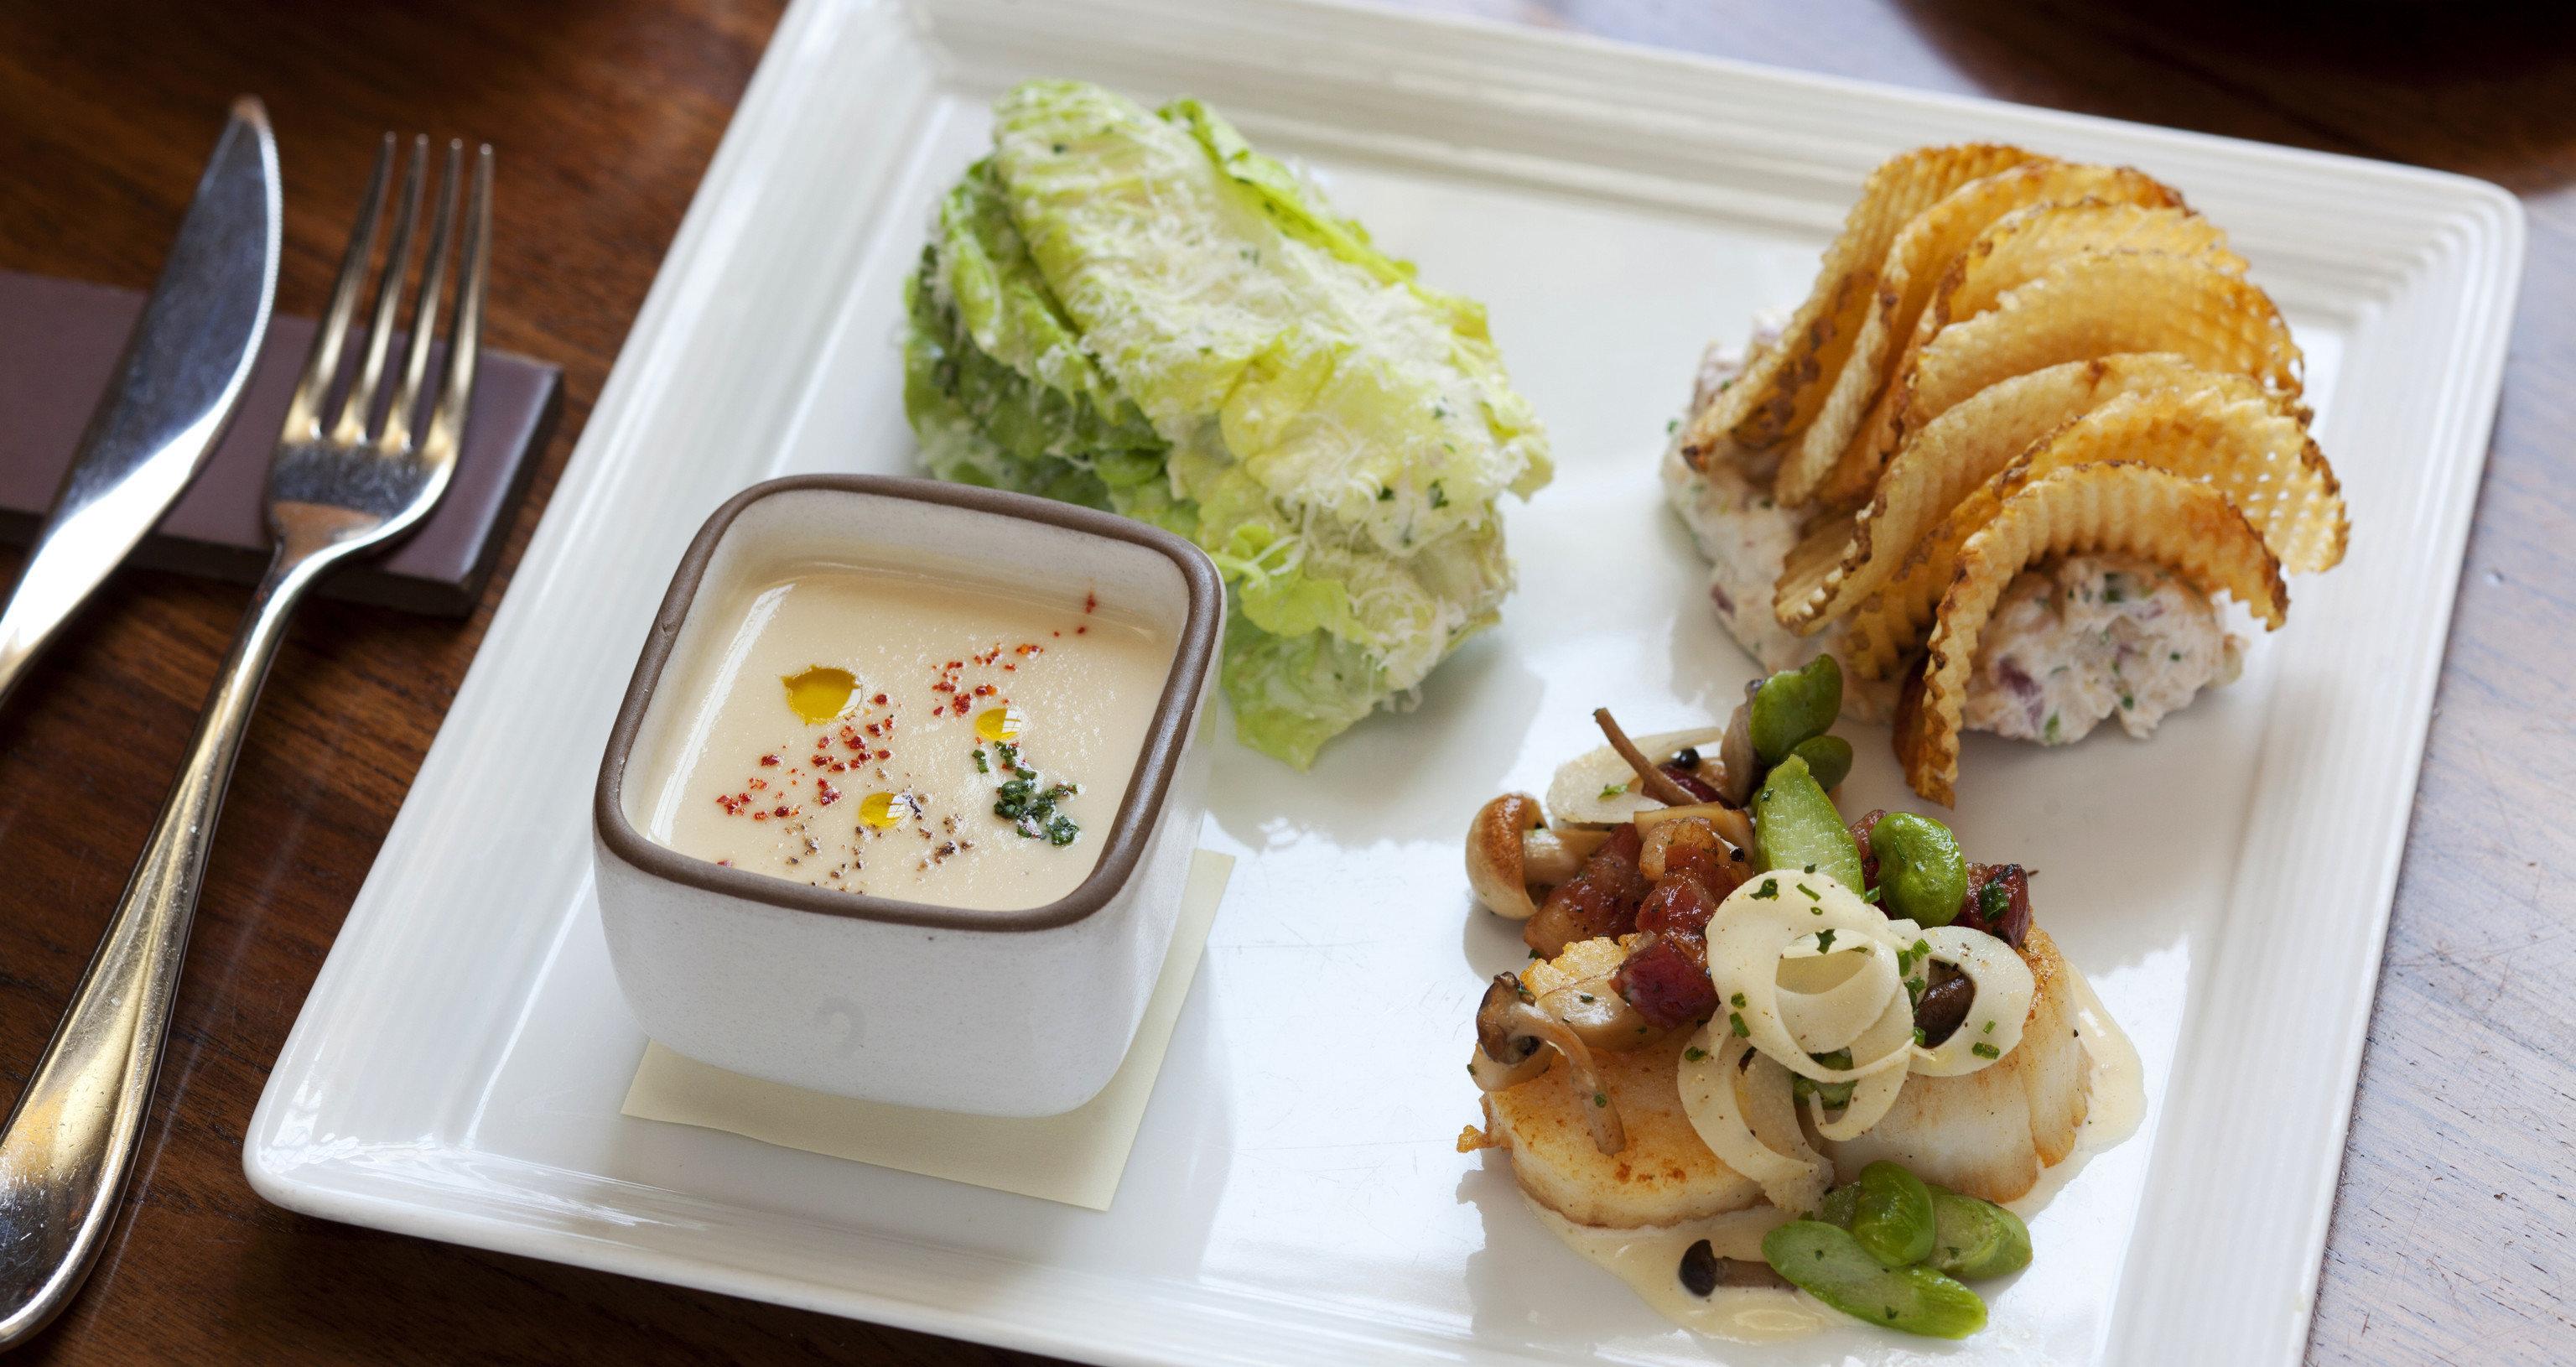 food plate lunch fork breakfast cuisine hors d oeuvre brunch restaurant asian food tray piece de resistance